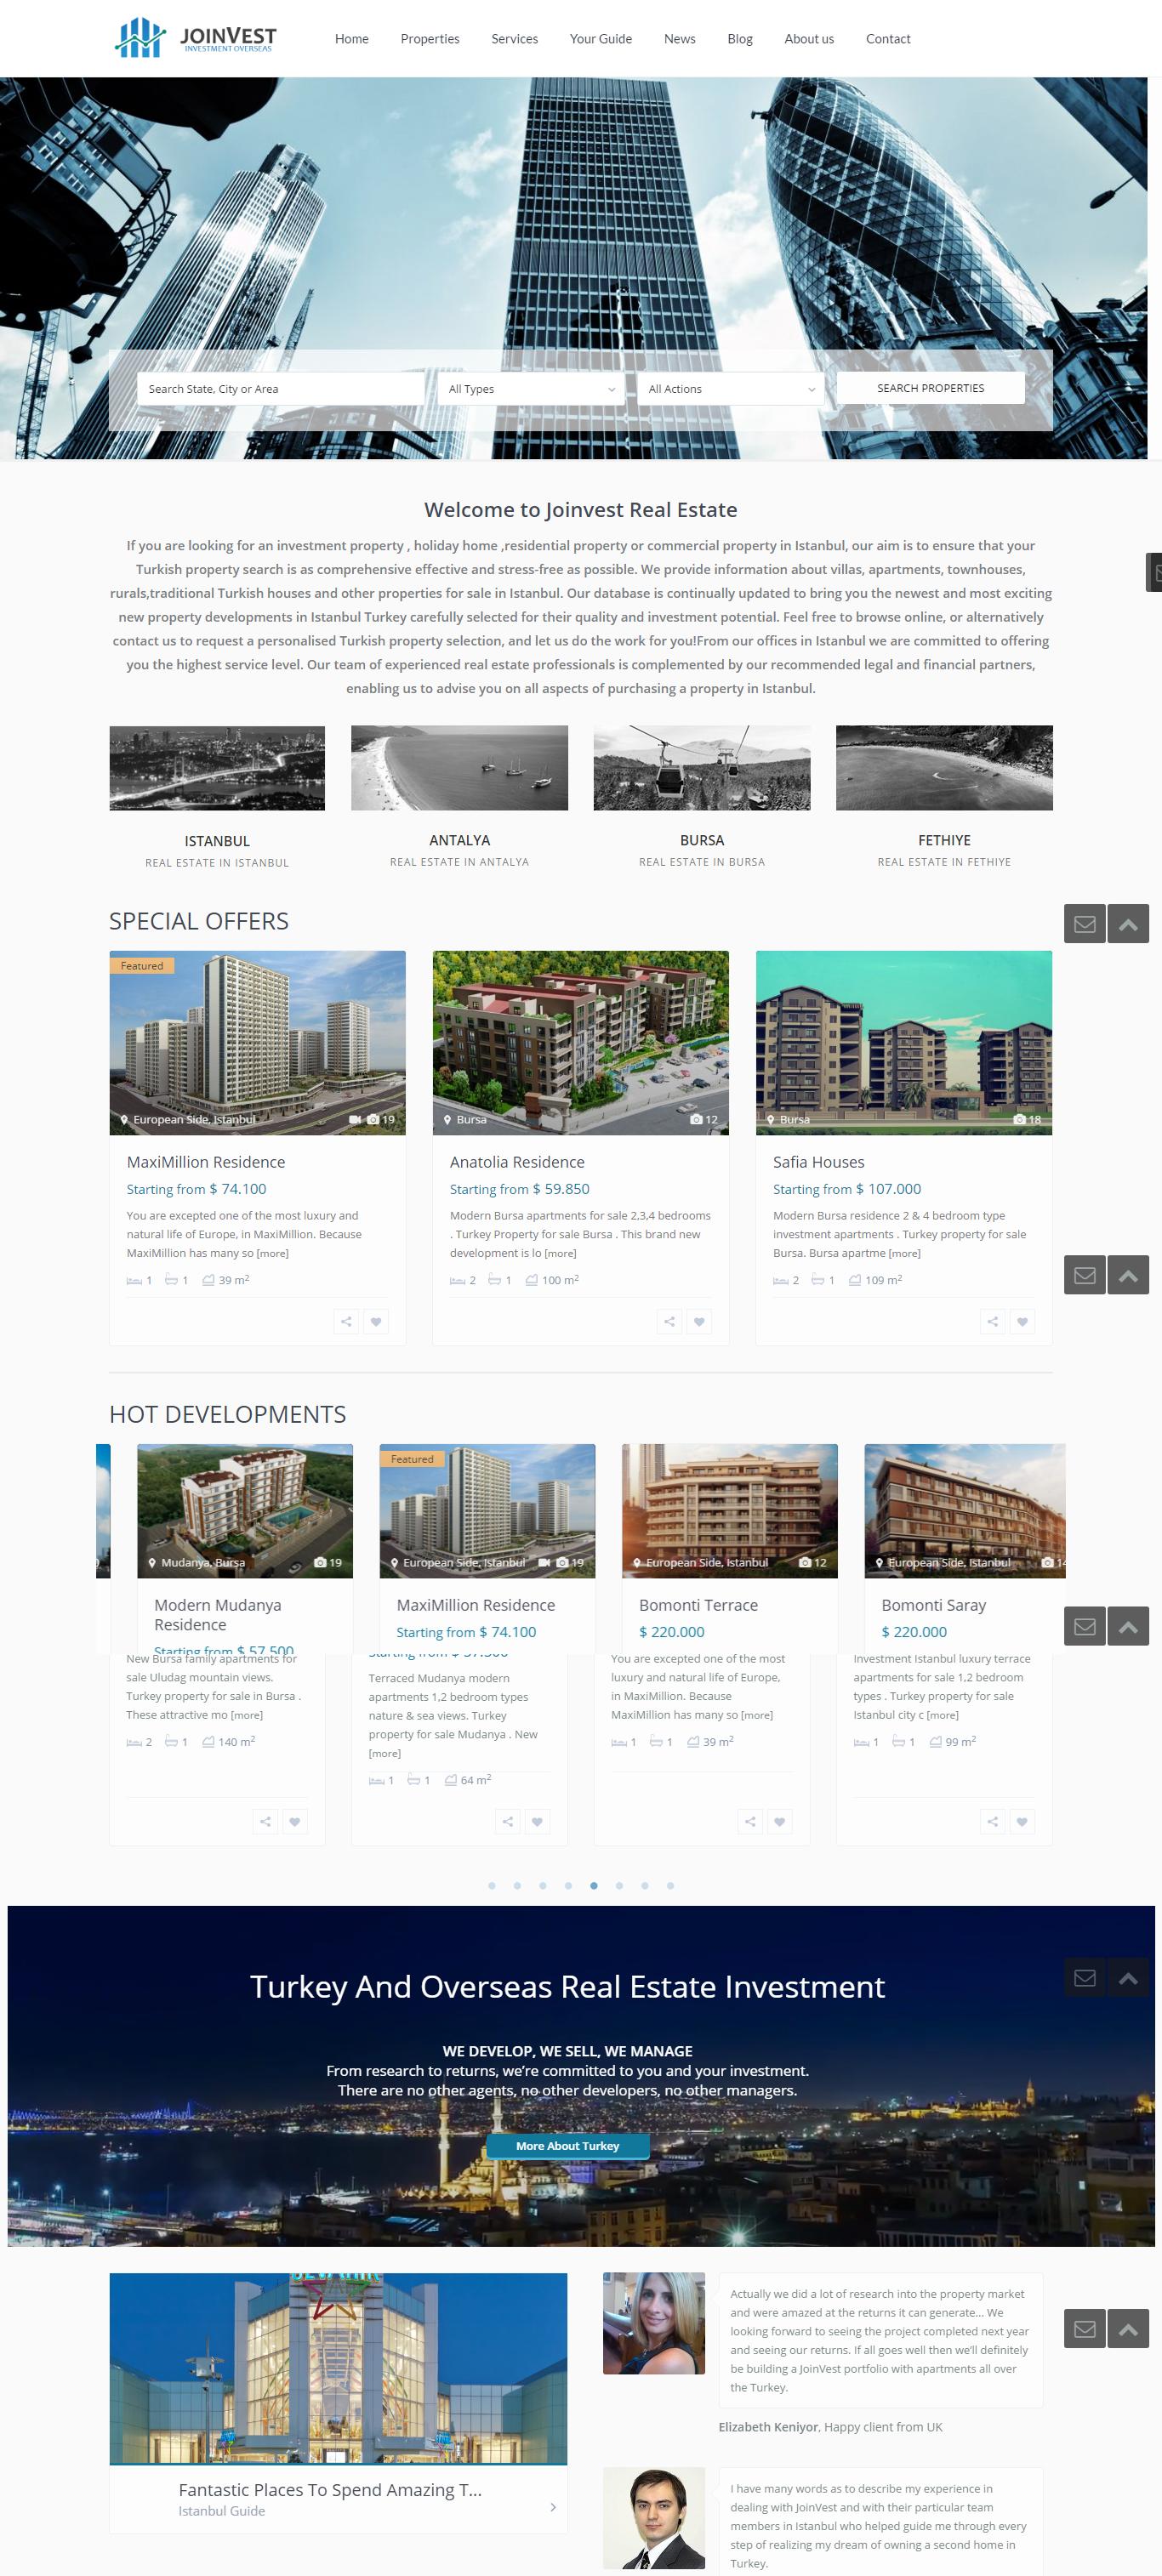 JoinVest Real estate website